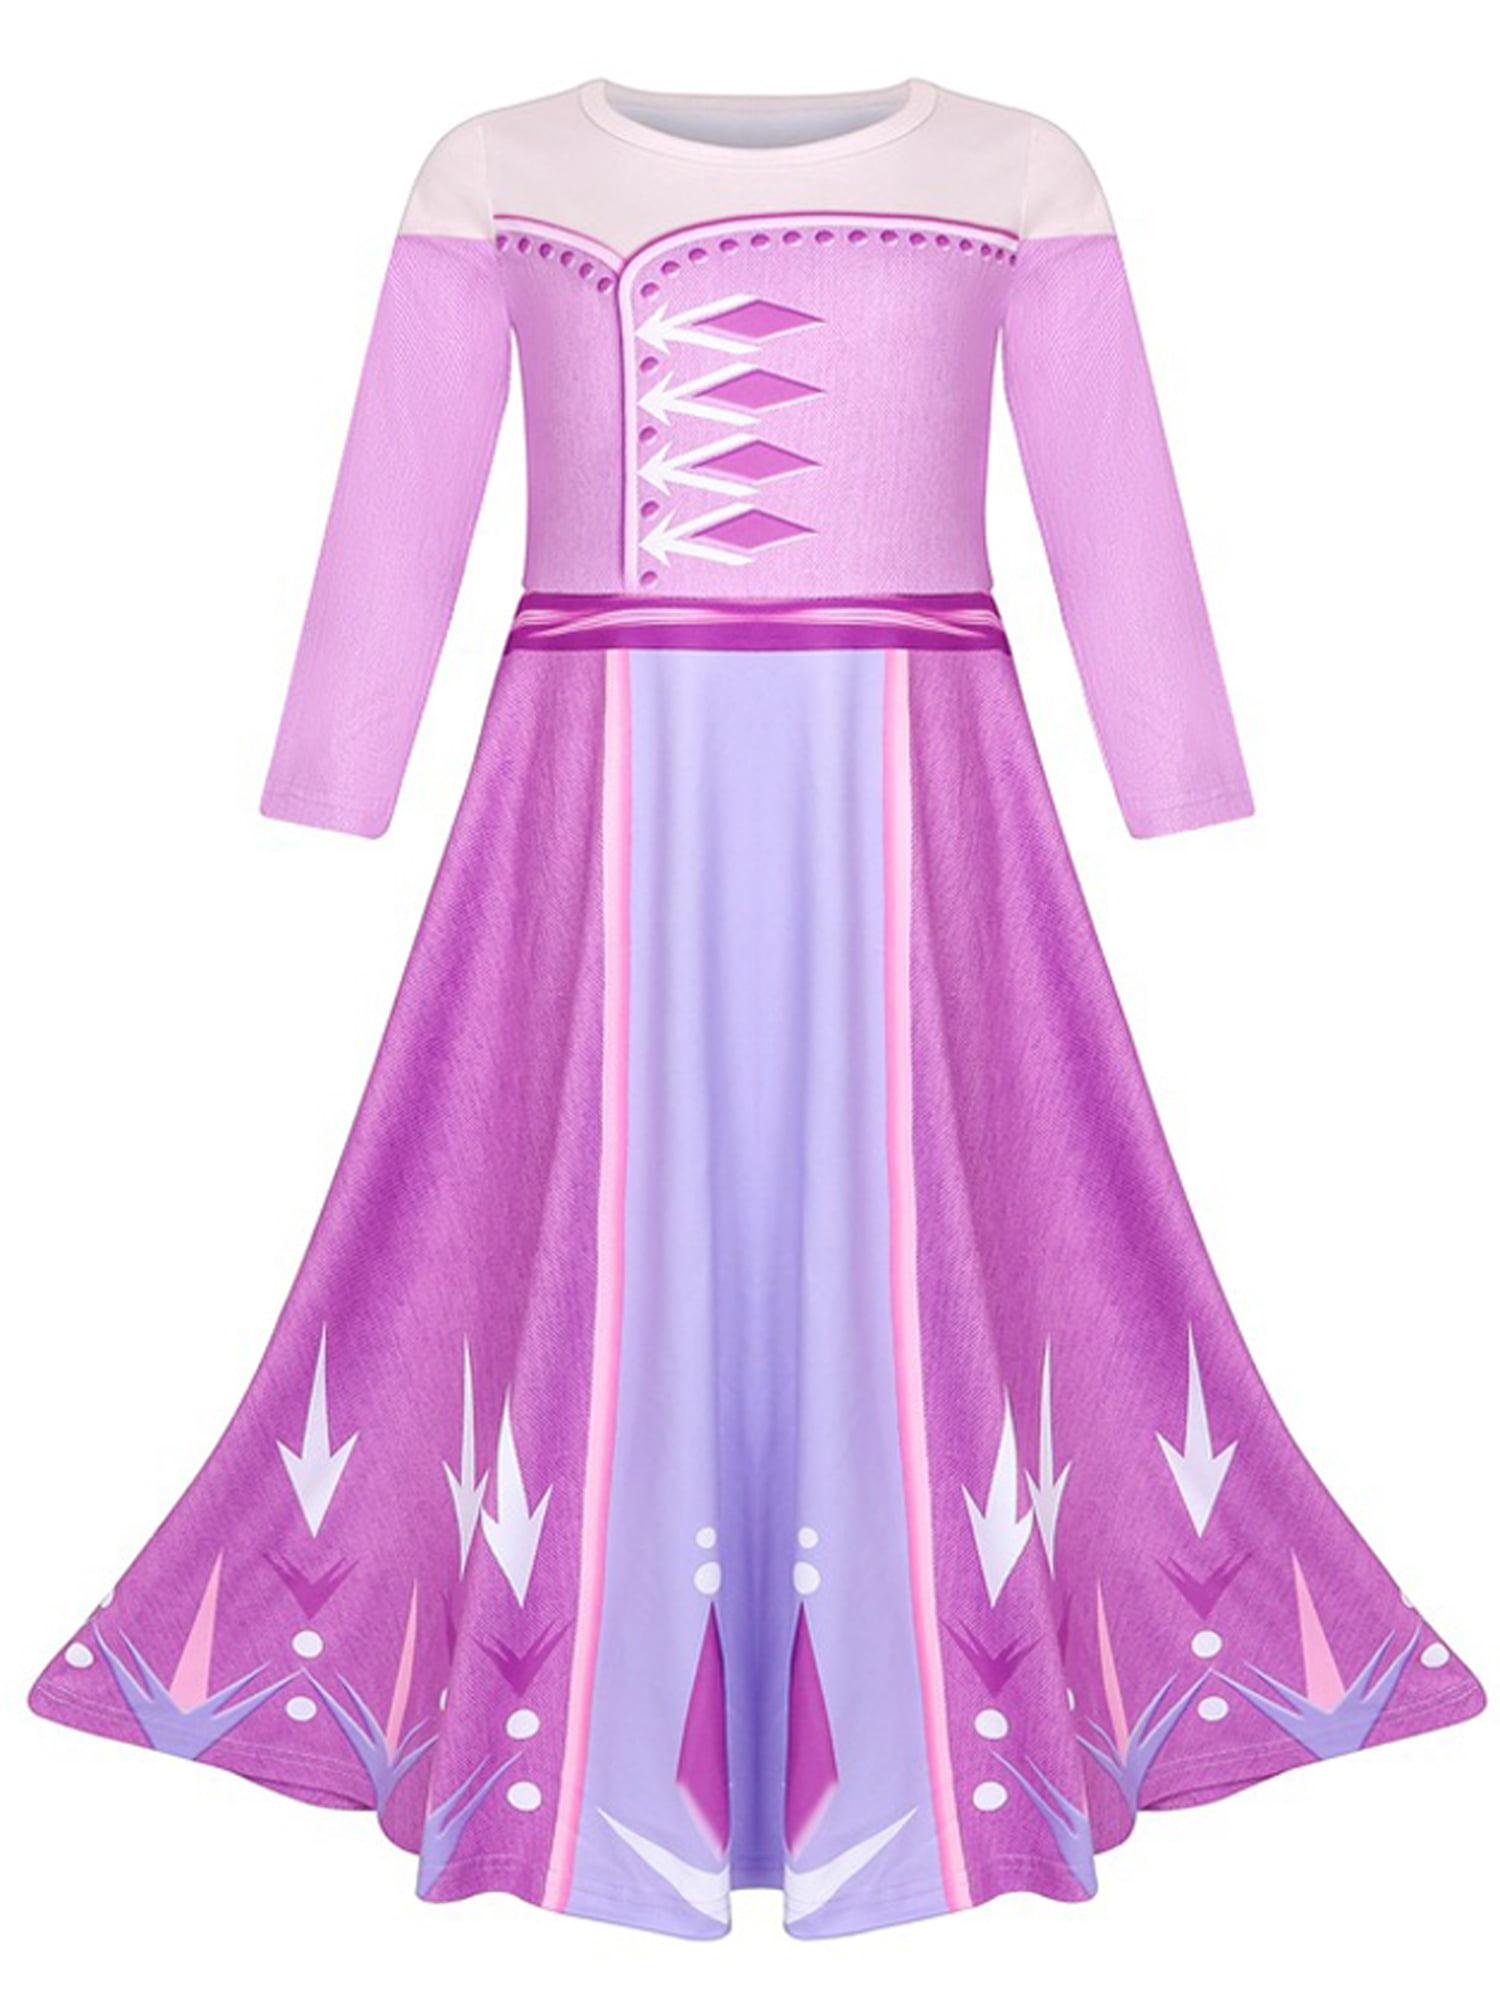 Frozen 2 Girls Costume Kids Queen Elsa Anna Cosplay  Children Fancy Dress Party